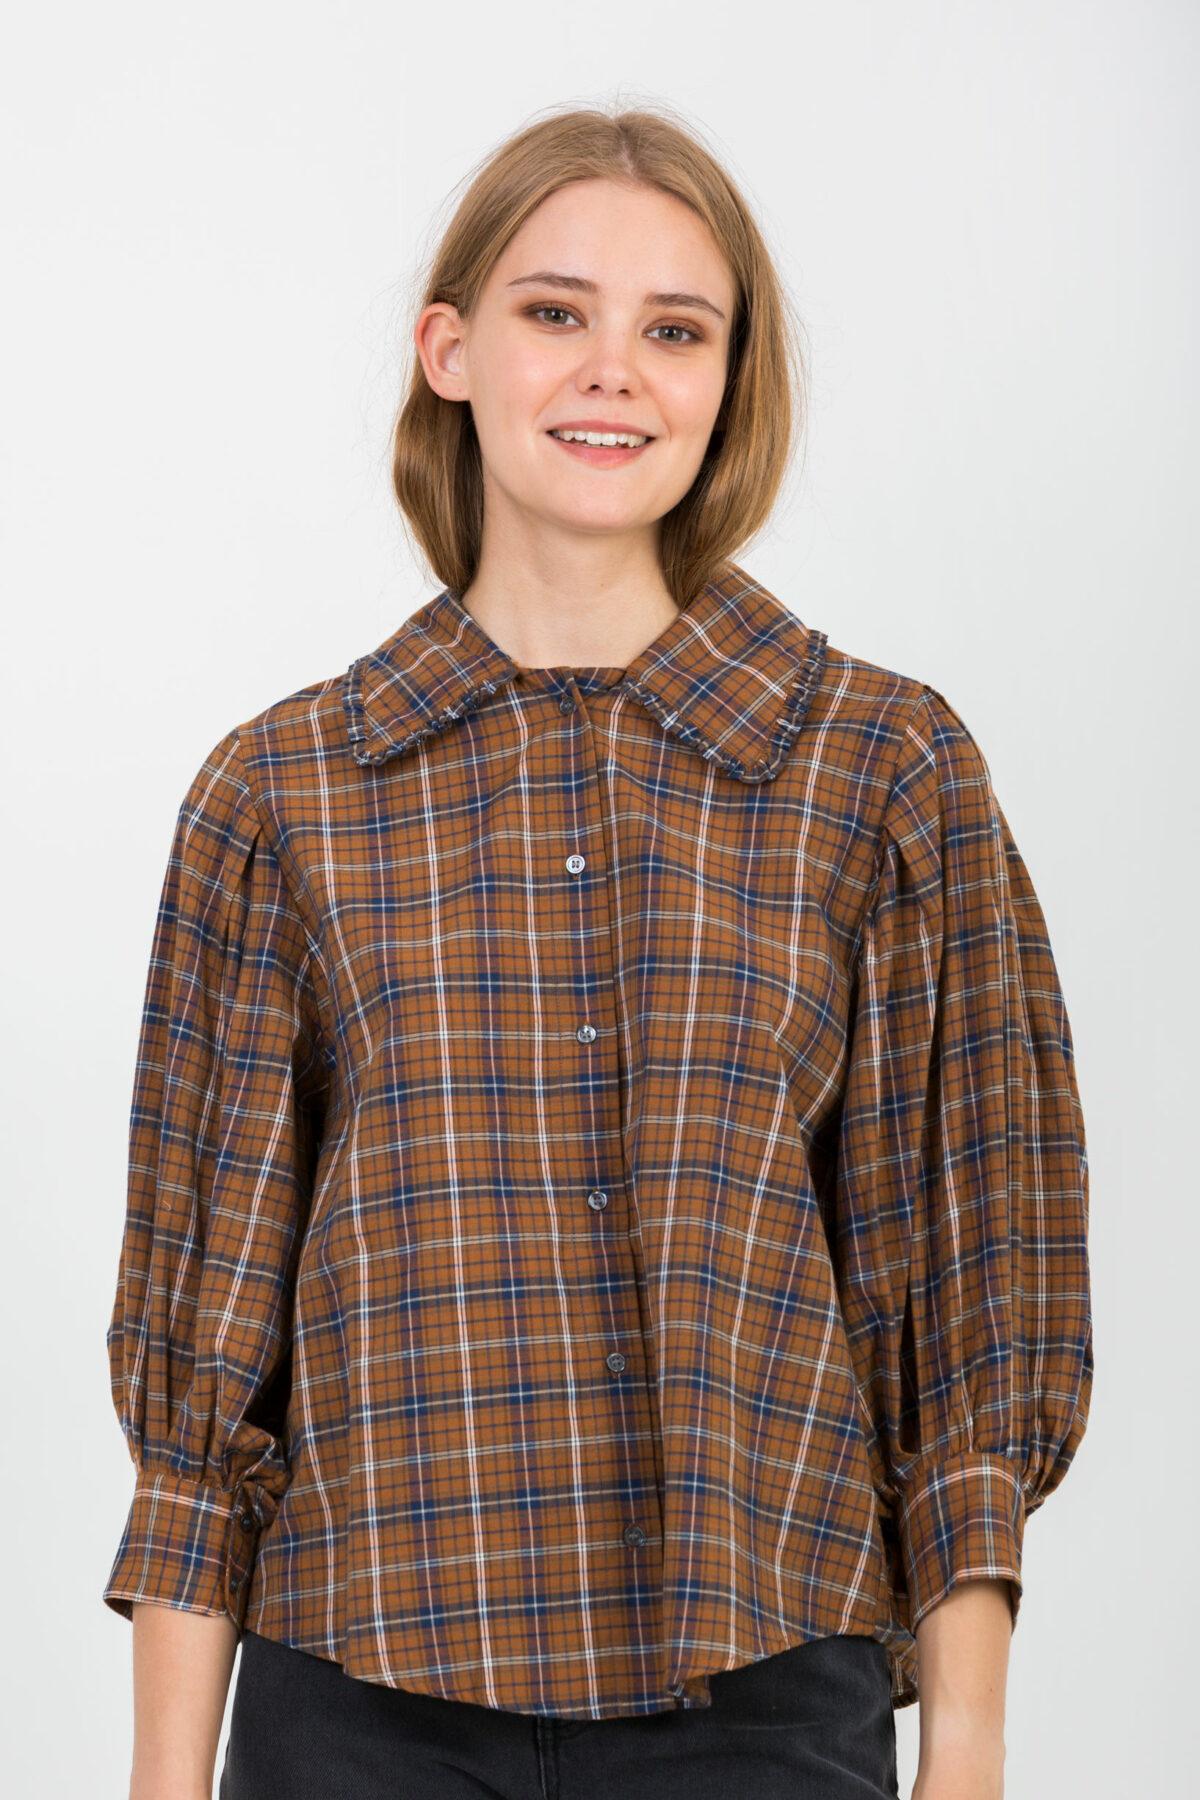 pony-checked-shirt-collar-balloon-sleeves-charlie-joe-matchboxathens